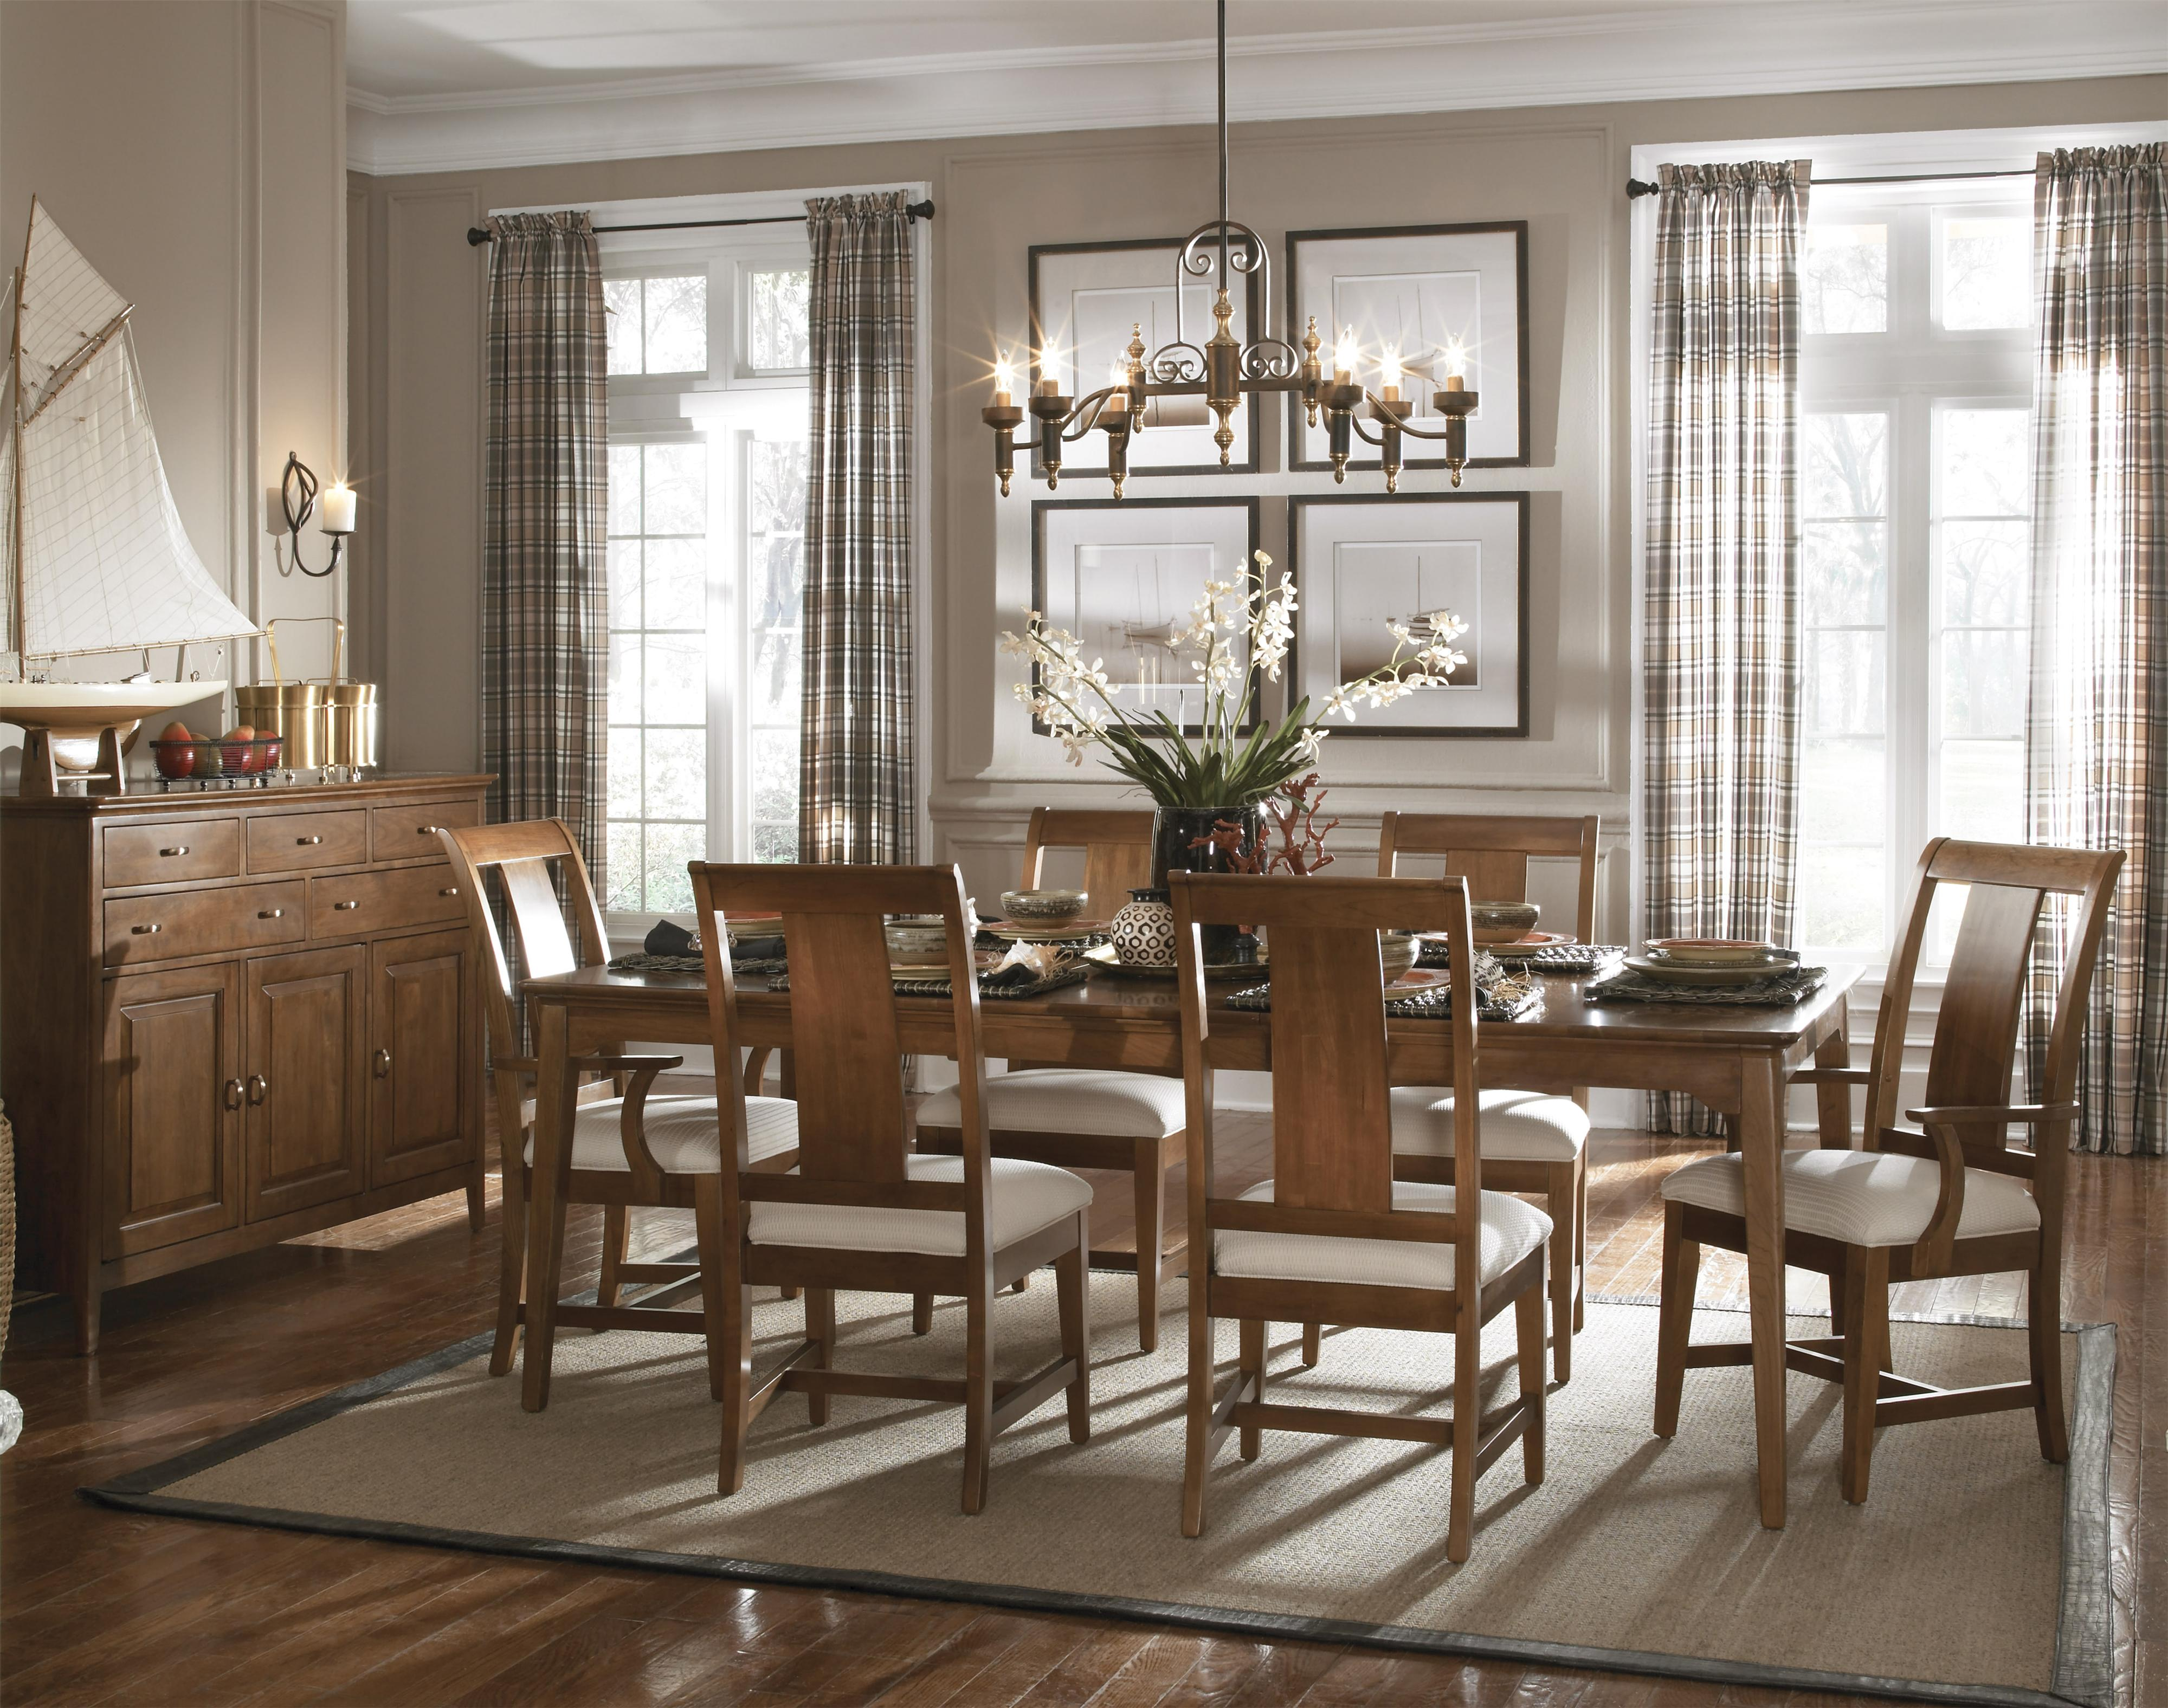 Kincaid tuscano dining room